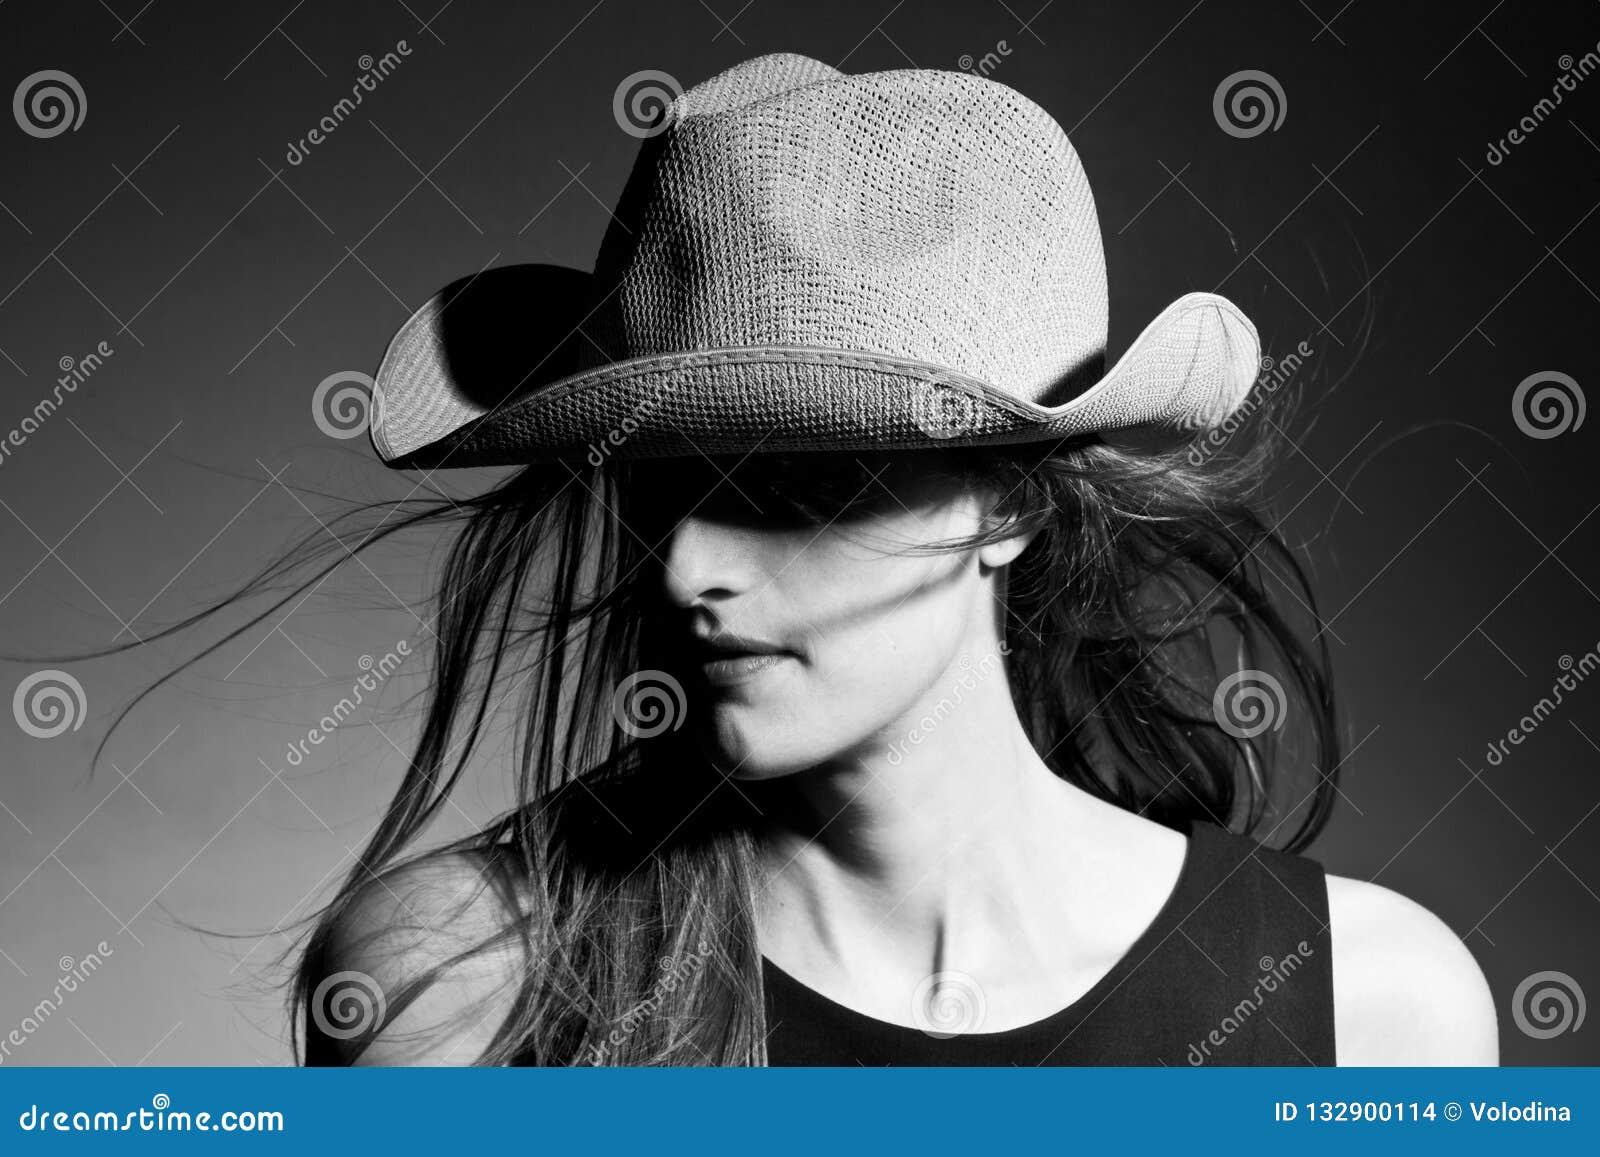 Portrait of cowboy lady stock photo. Image of comfortable - 132900114 cd289a0c275c